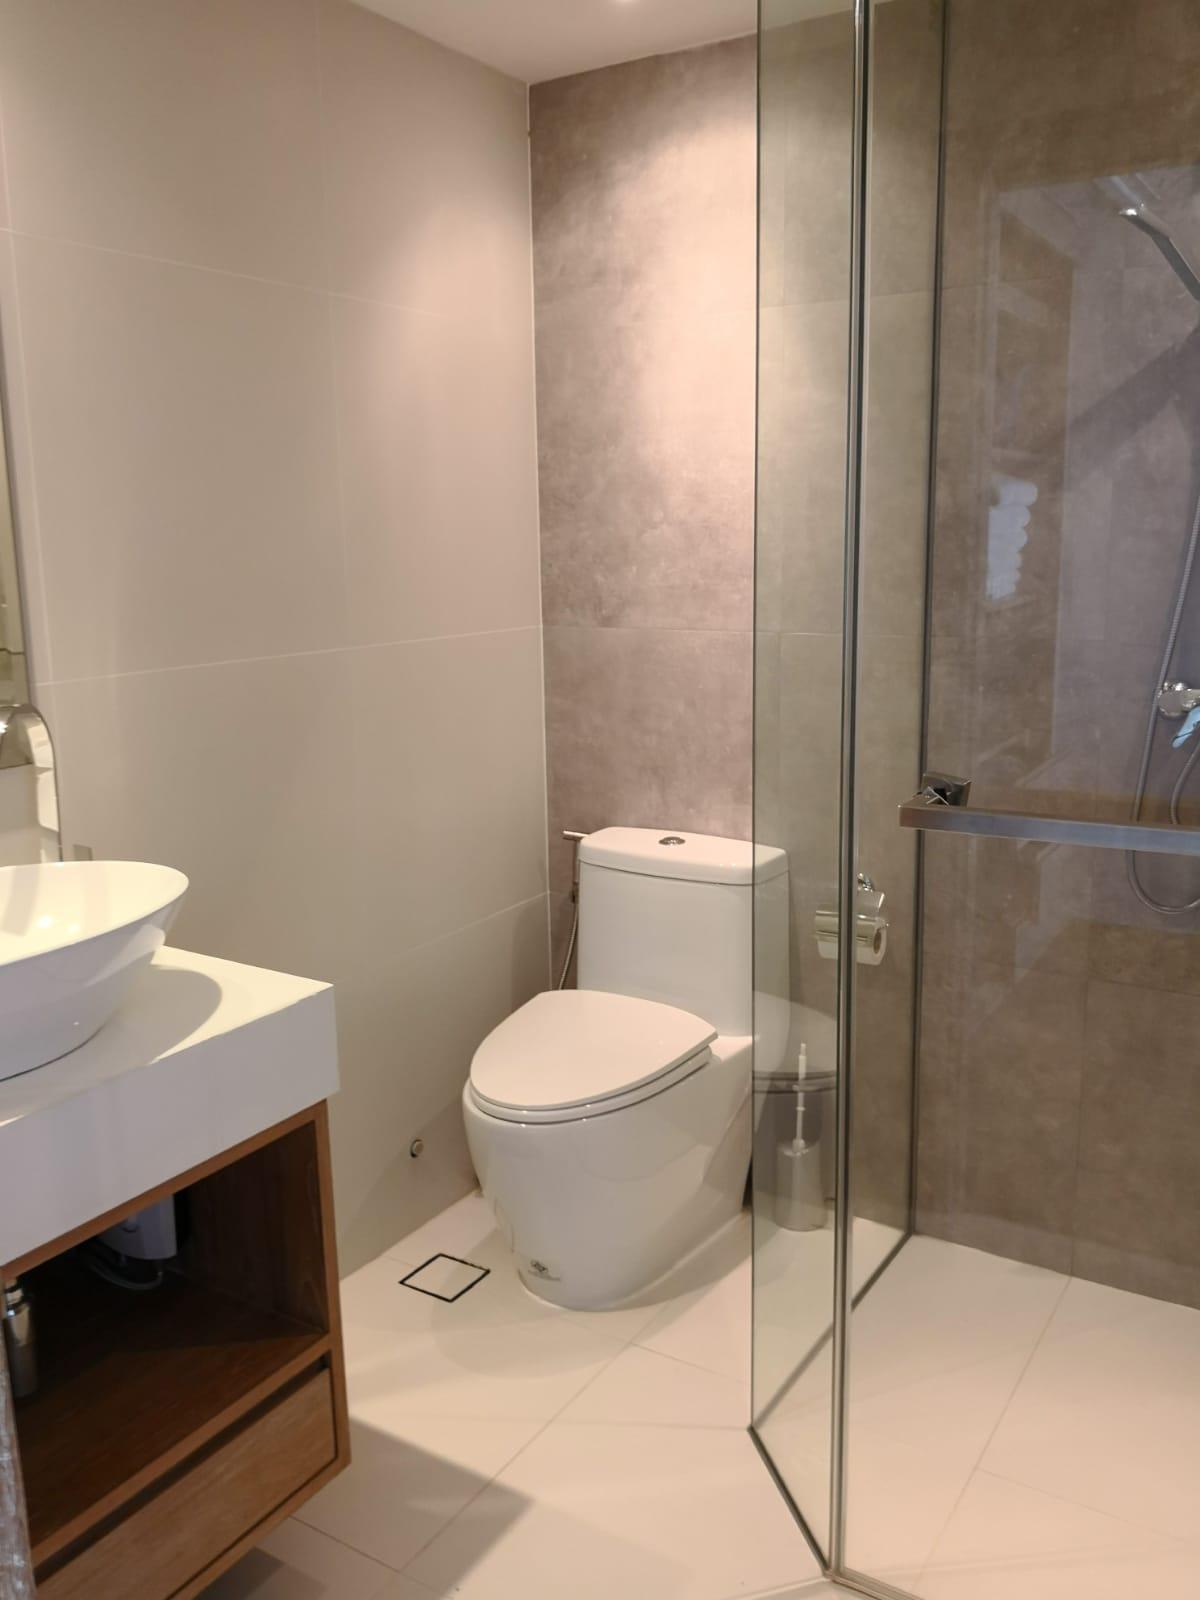 Allamanda 2 Bedroom-82995ce4-e4ad-497c-8fc0-238fb1ce7e4b.jpg